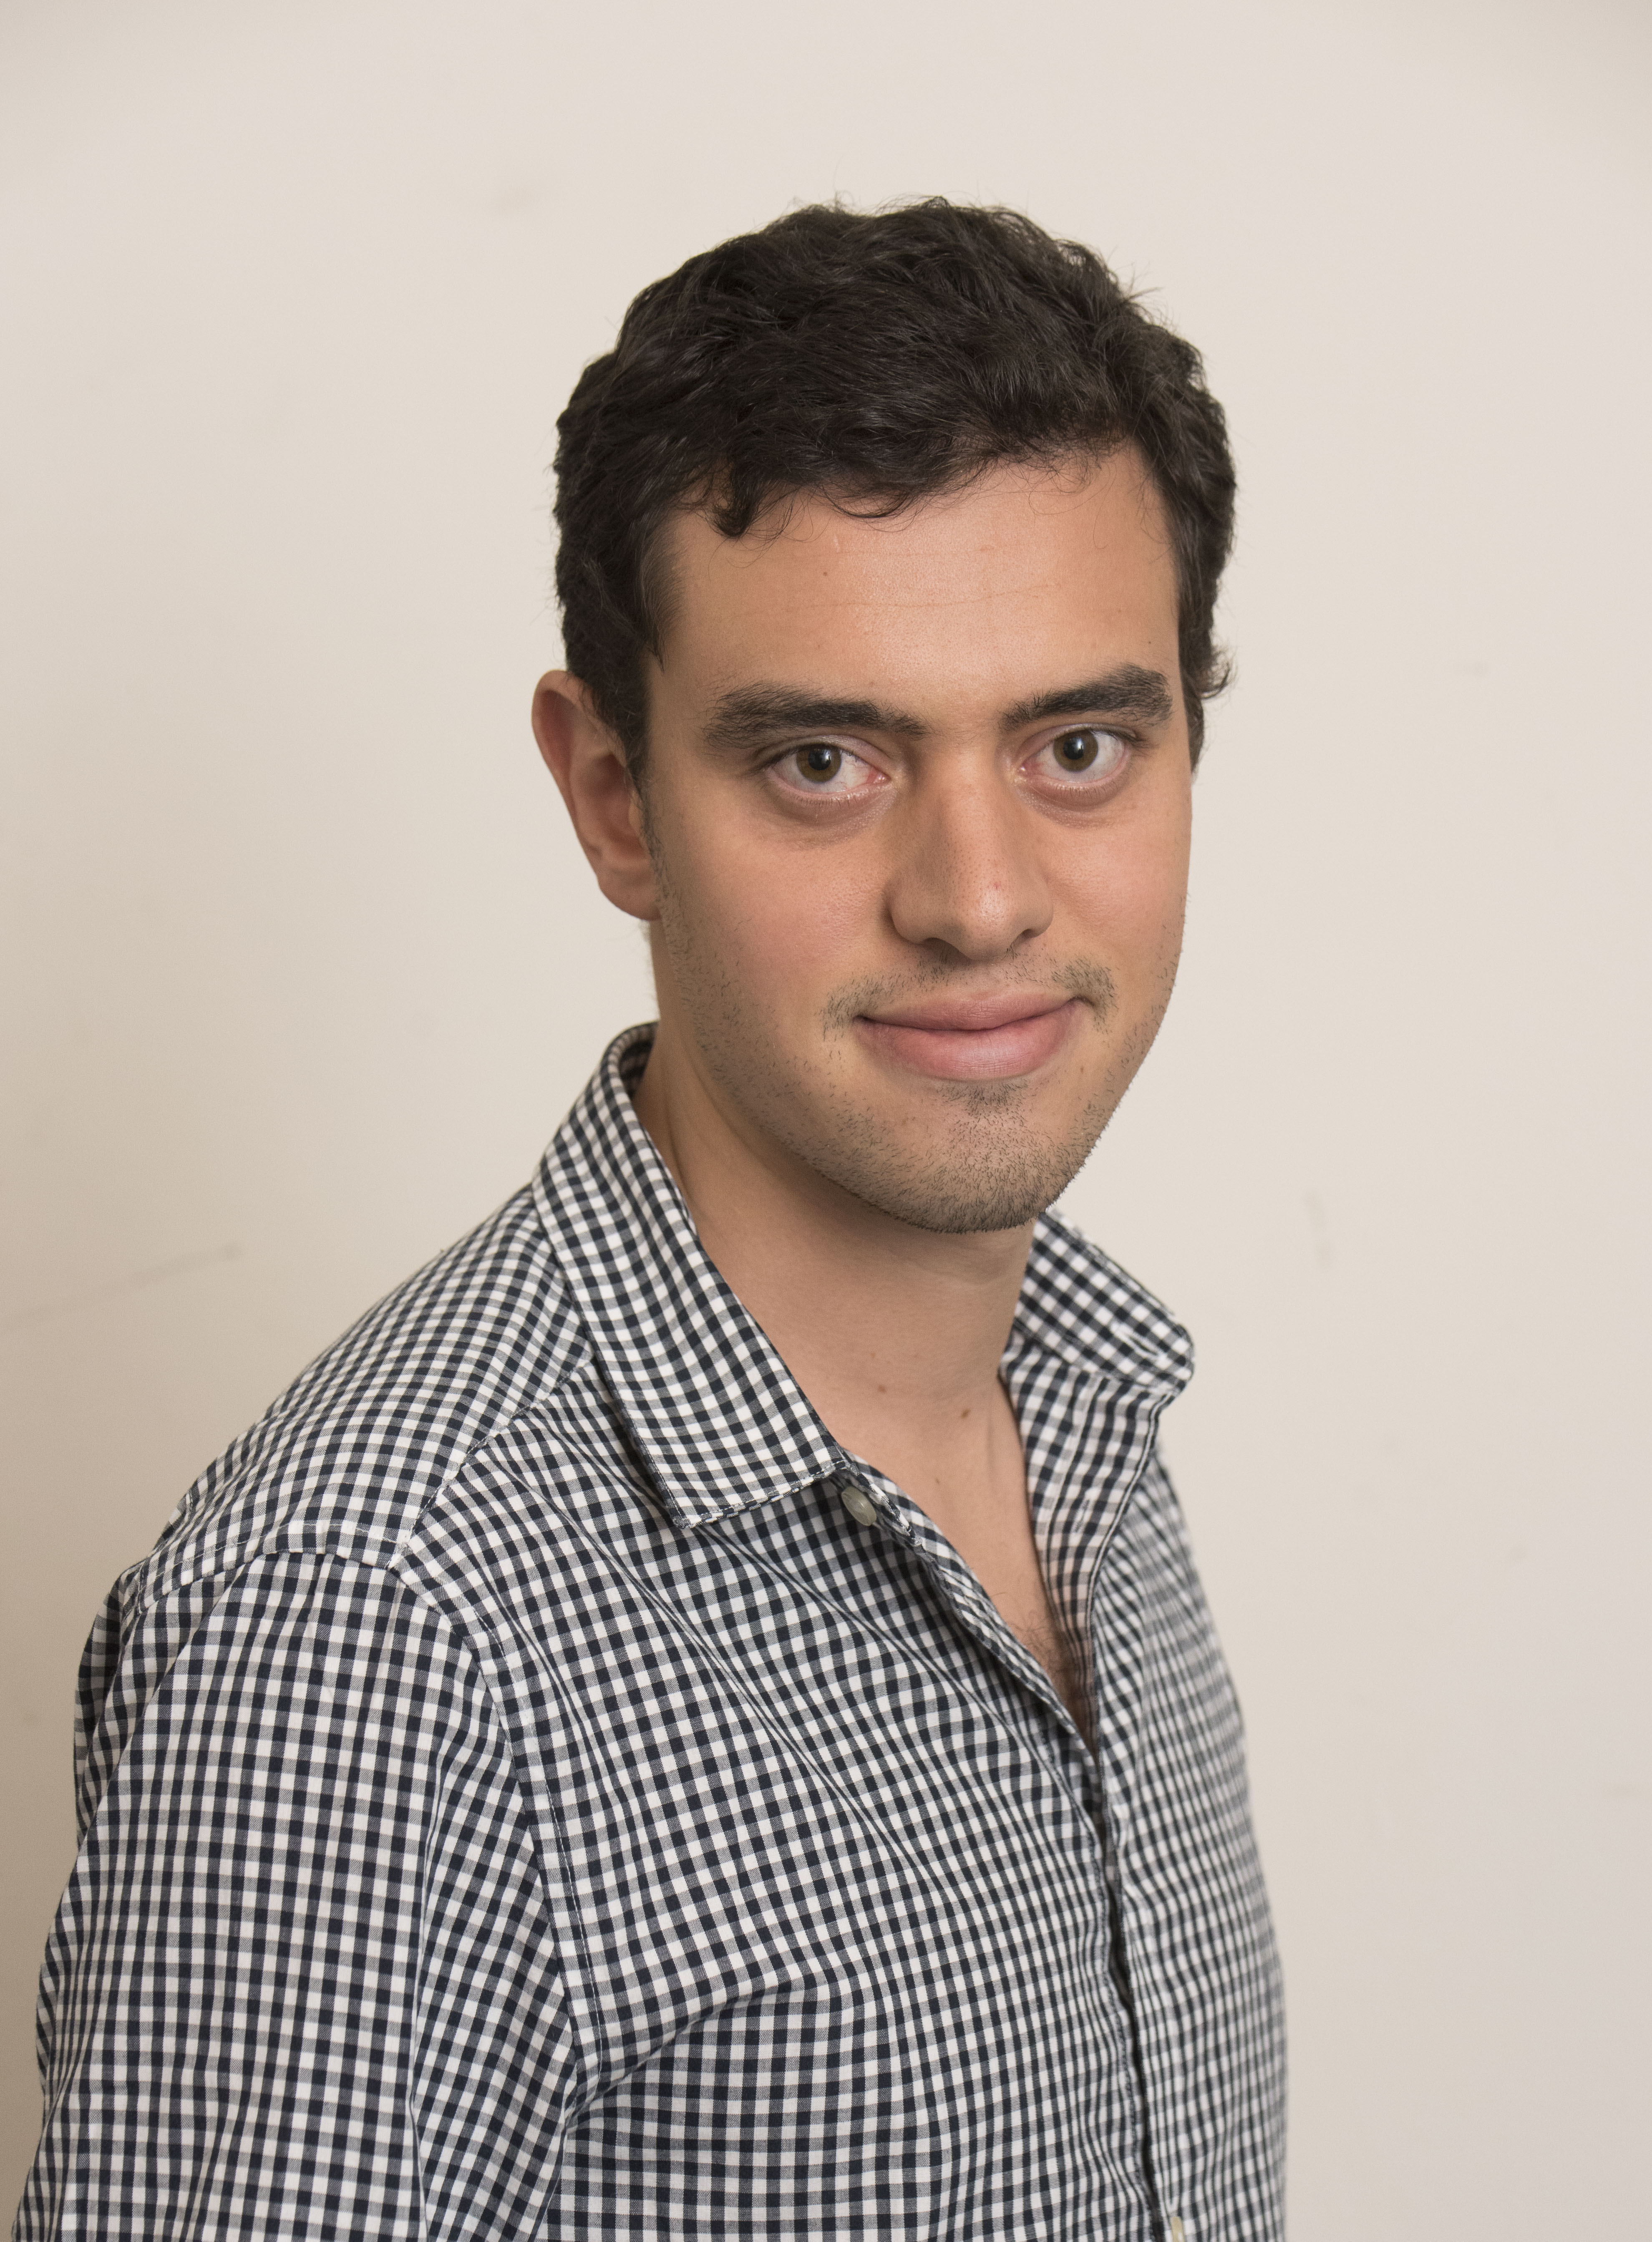 Headshot of Juan Sokoloff